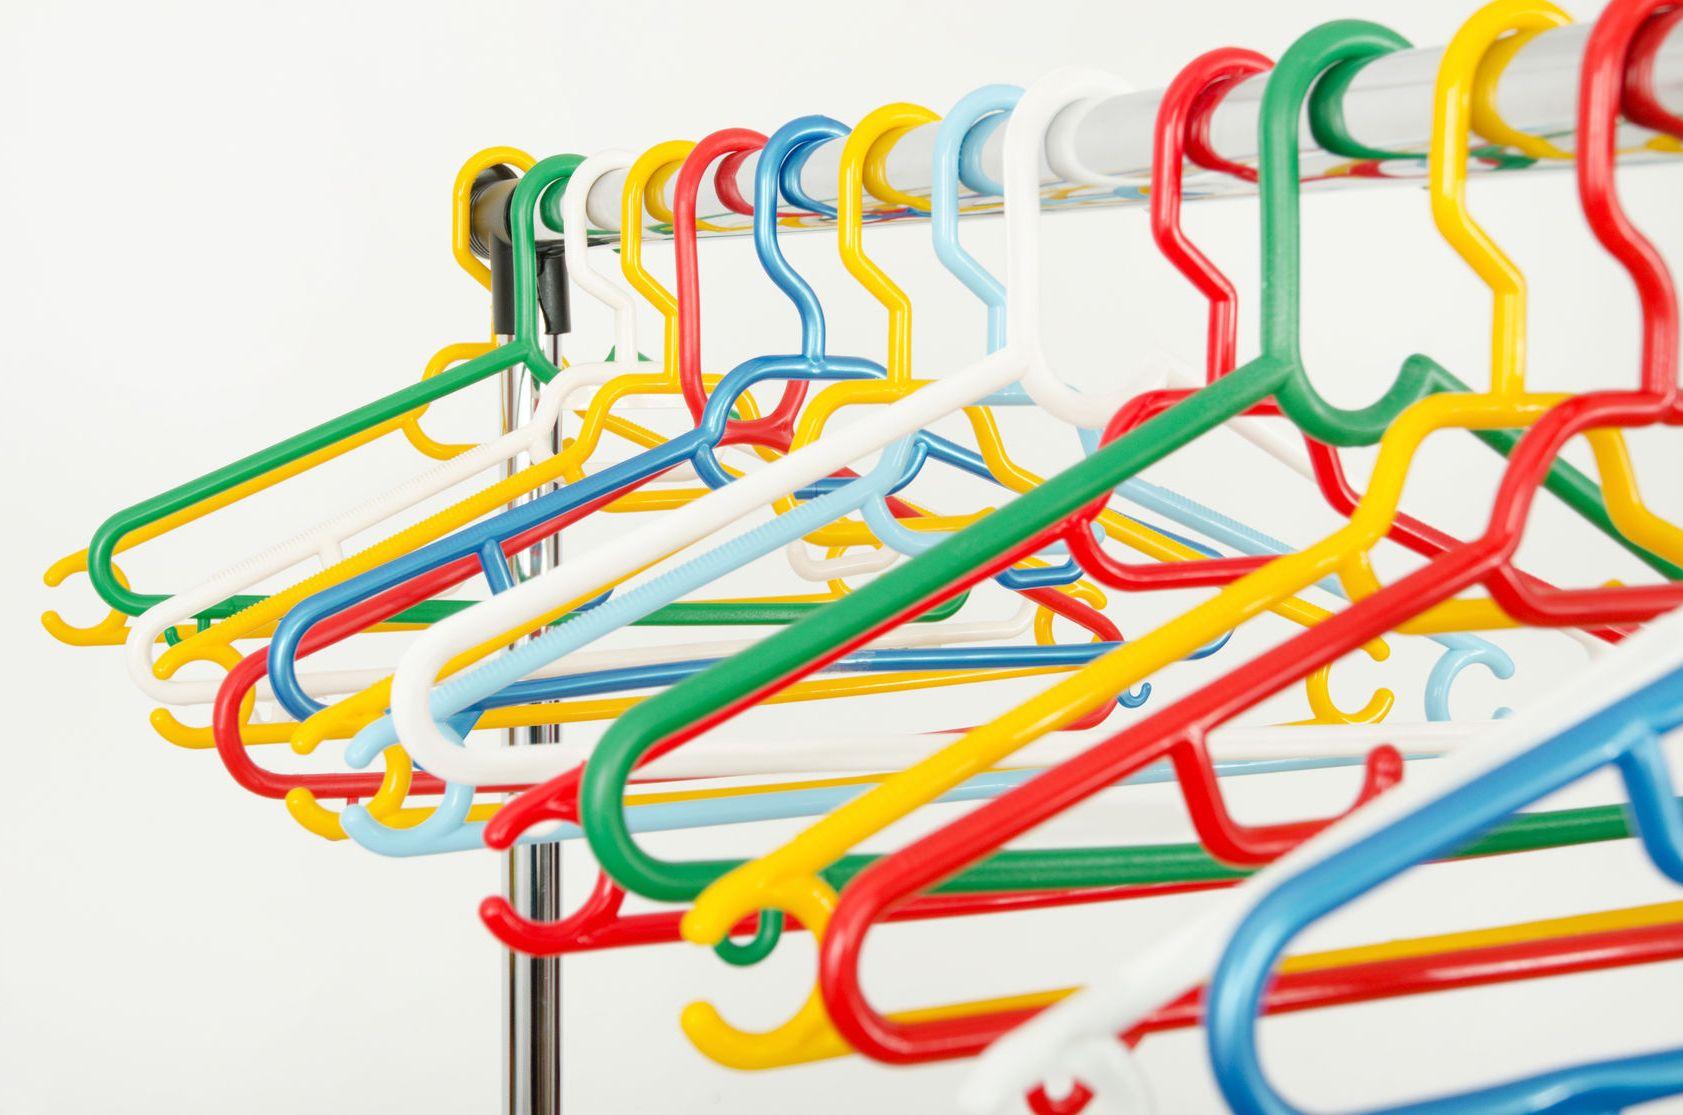 New blog post! How to organize your closet in real life! #organizingtip #storageideas #profesionalorganizer